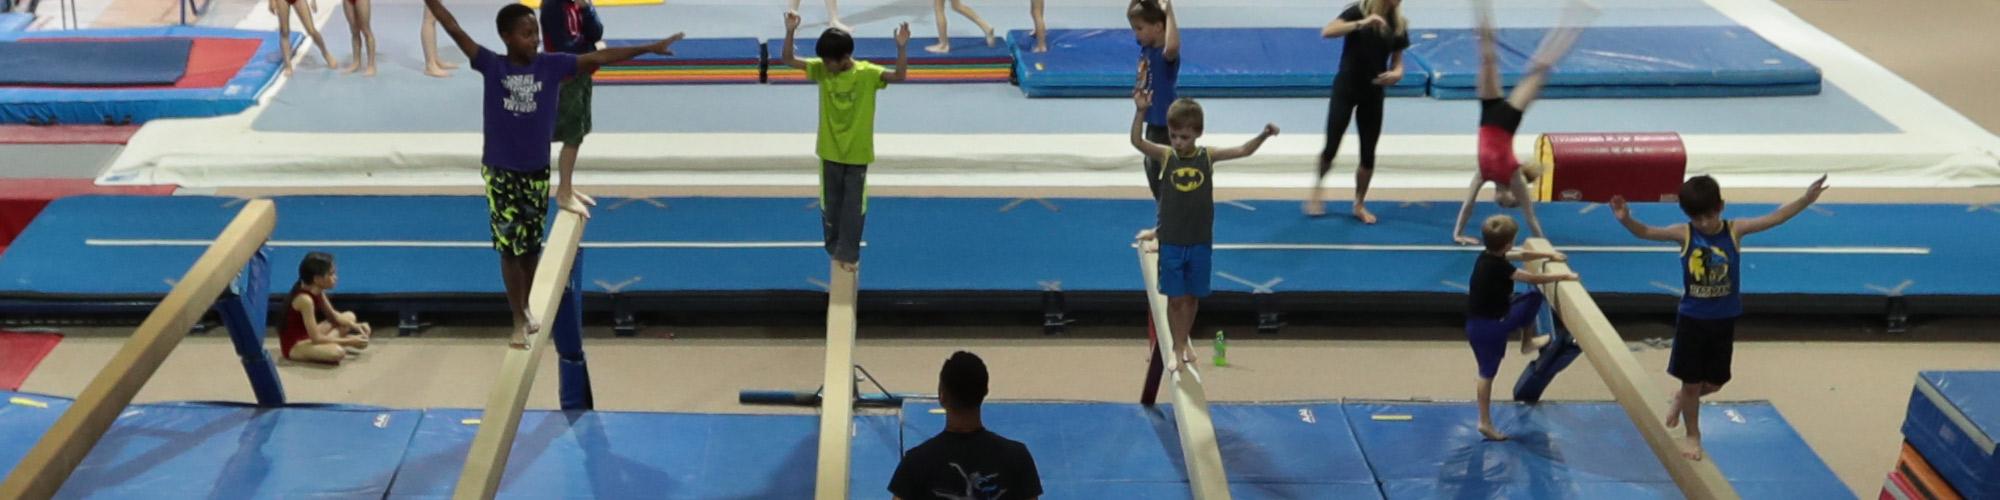 Gymnastics Photo Gallery